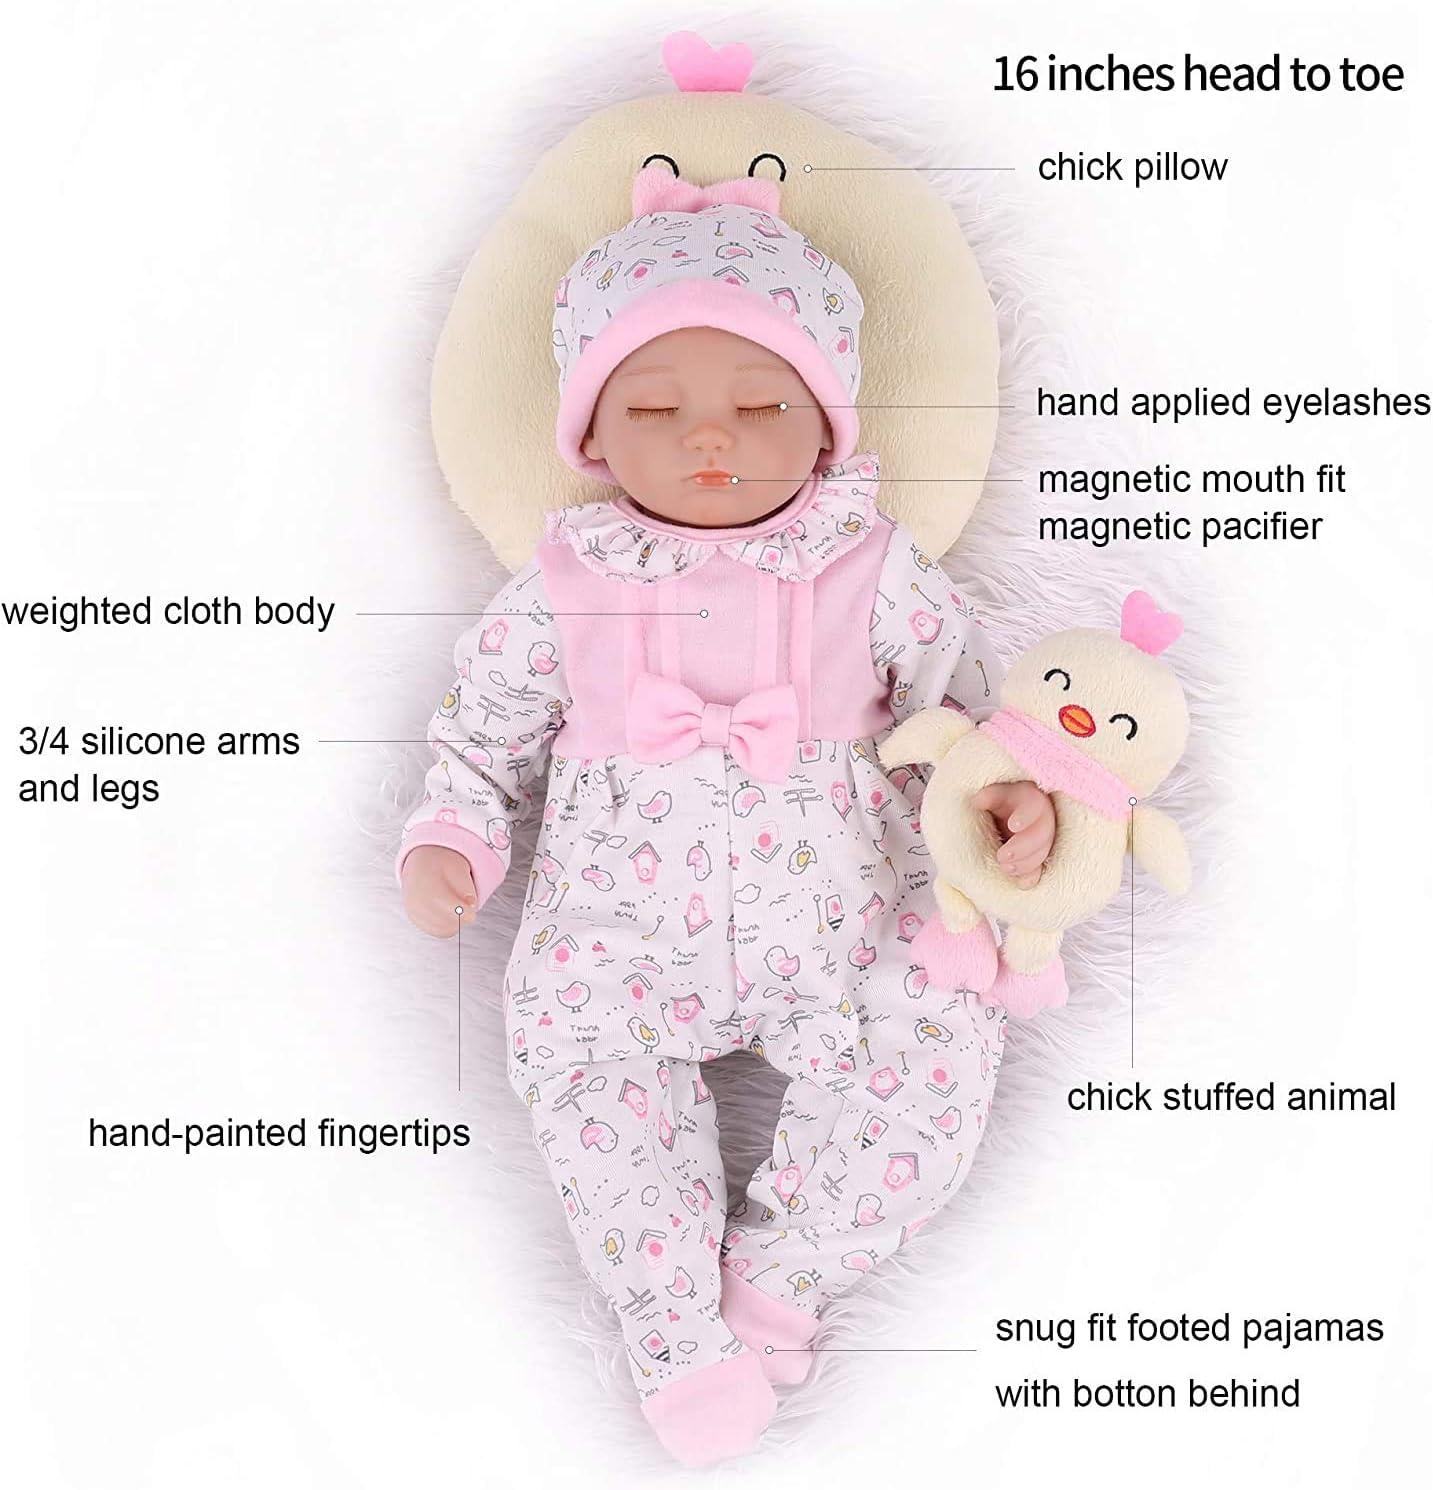 Kaydora Reborn Baby Dolls 16inch Sleeping Realistic Baby Reborn Dolls That Look Real Handmade Soft Vinyl Weighted Body Lifelike Baby Dolls for Girl Age 3+